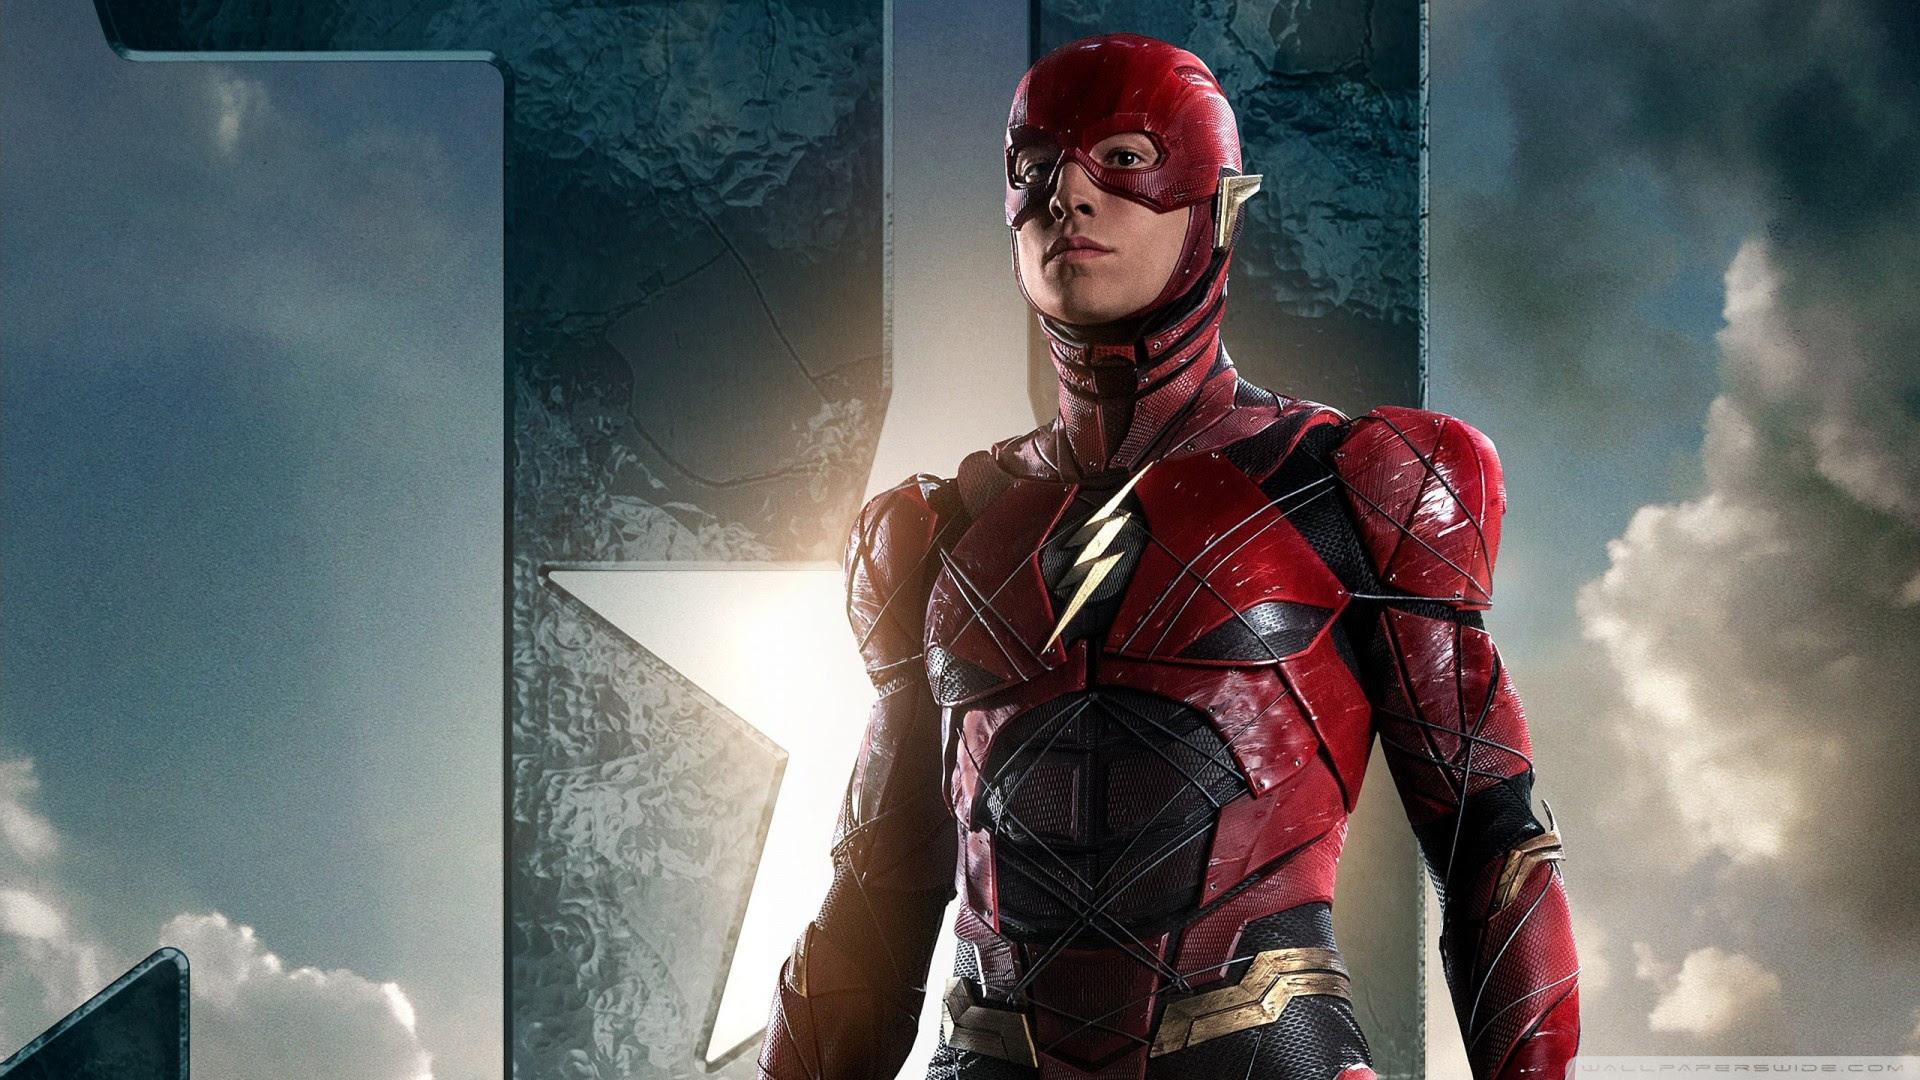 The Flash In Justice League Ultra Hd Desktop Background Wallpaper